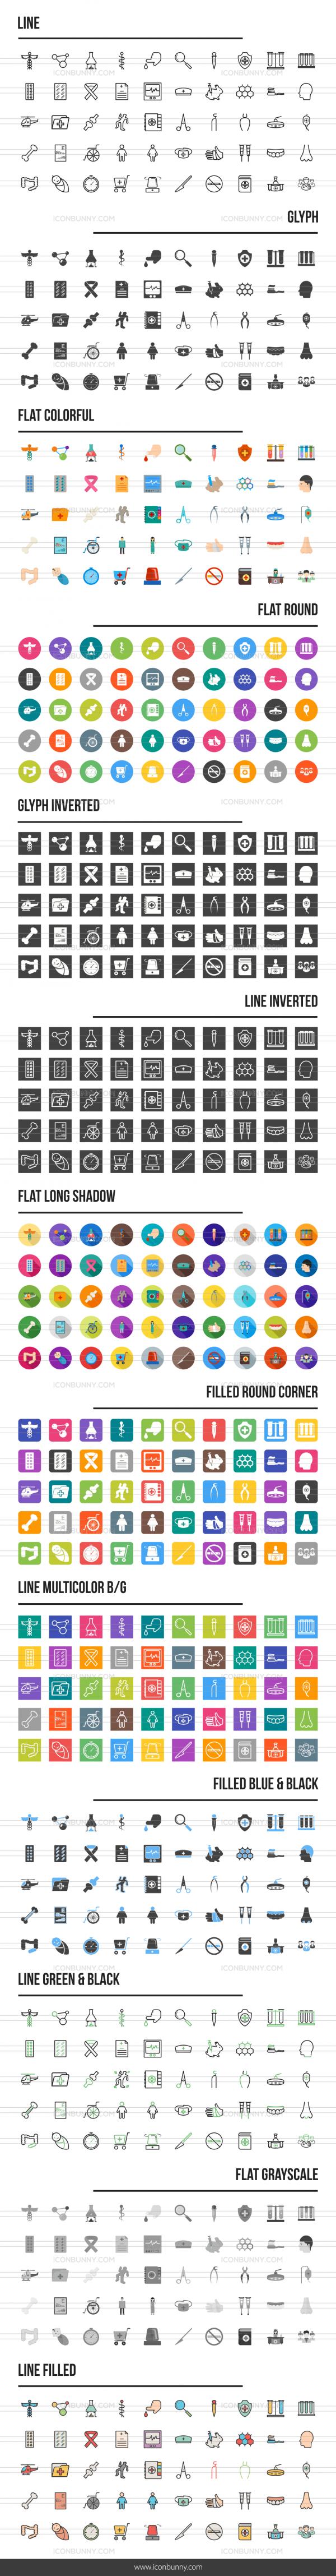 Healthcare Icons Bundle - Preview - IconBunny